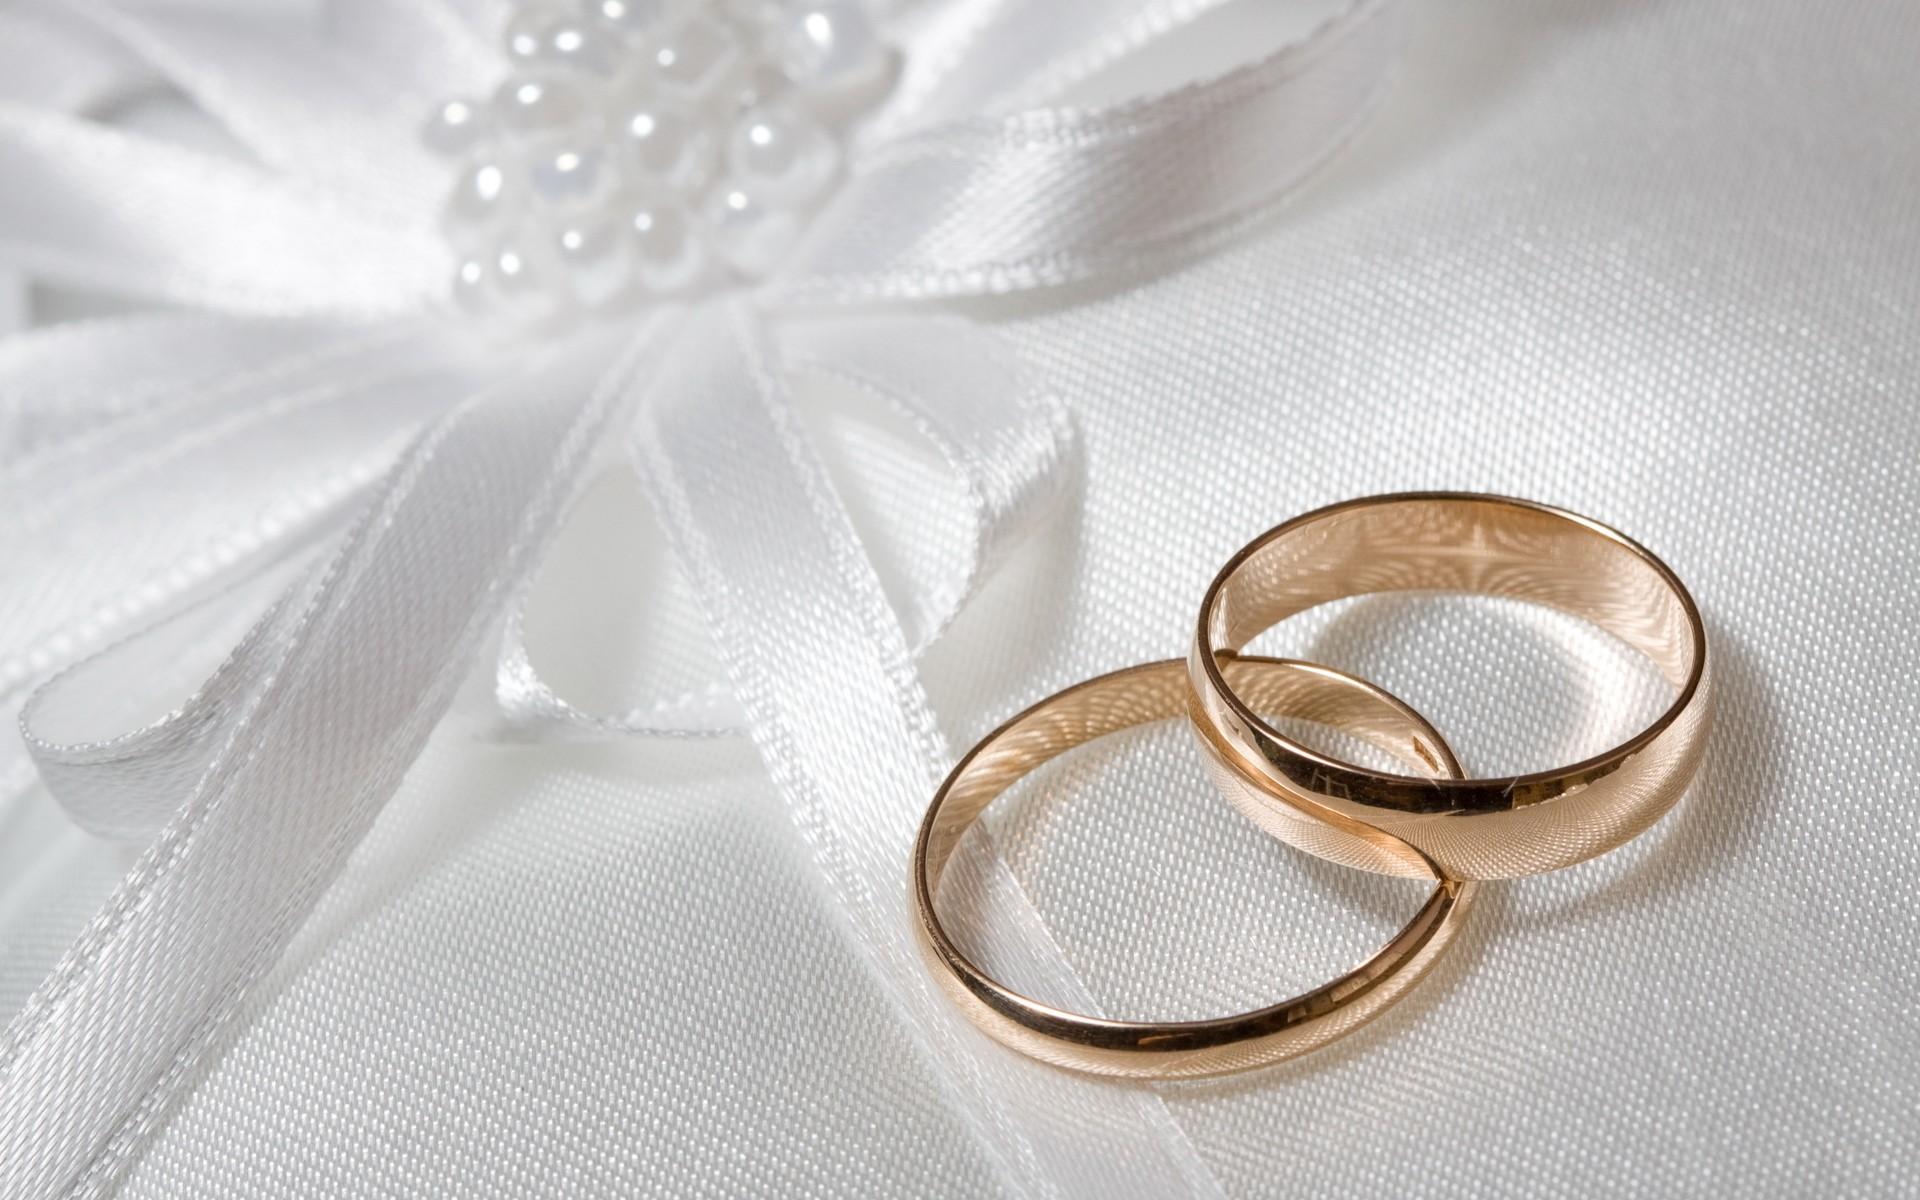 Anillos de matrimonio - 1920x1200